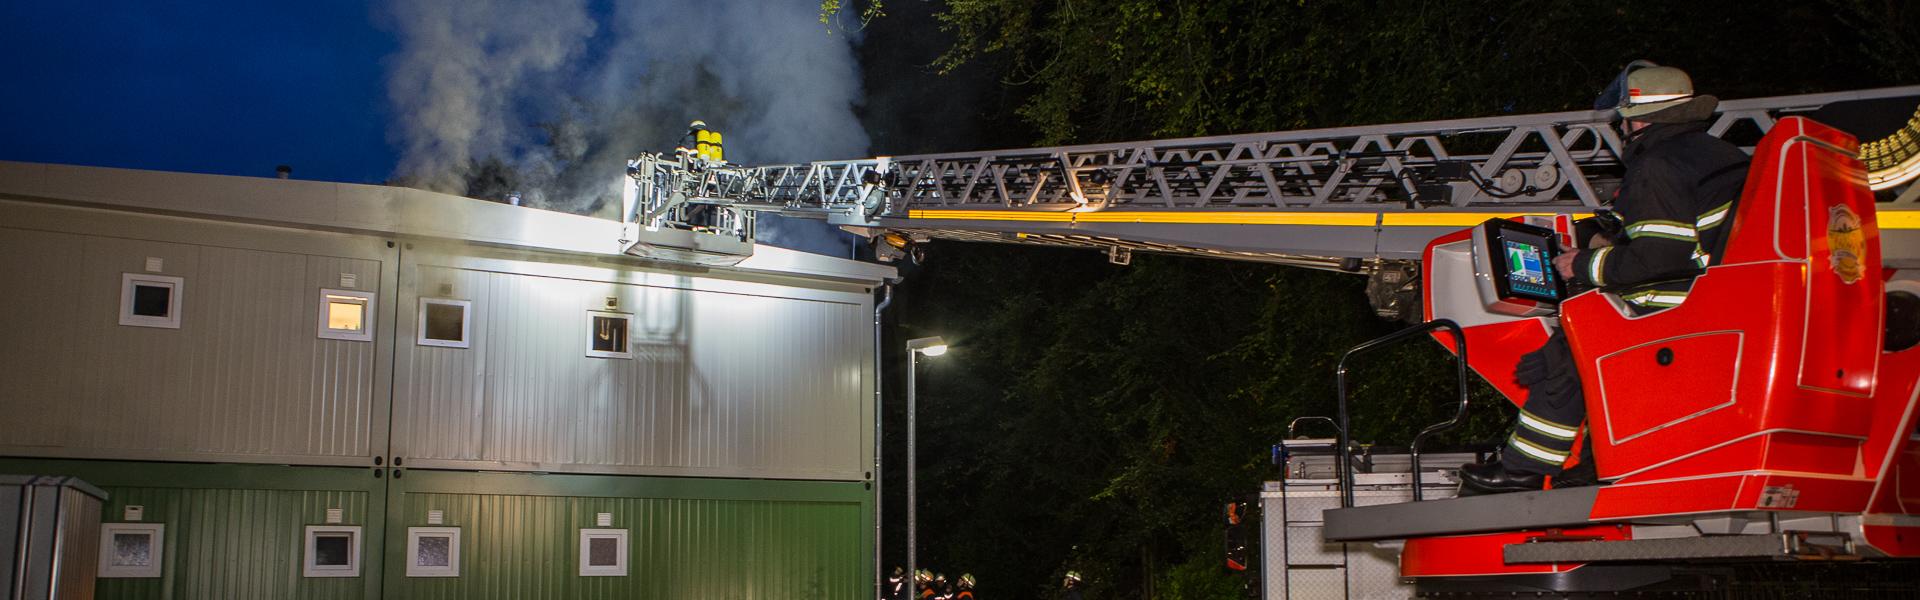 30.09.2017 – Feuer in Klein Borsteler Flüchtlingsunterkunft